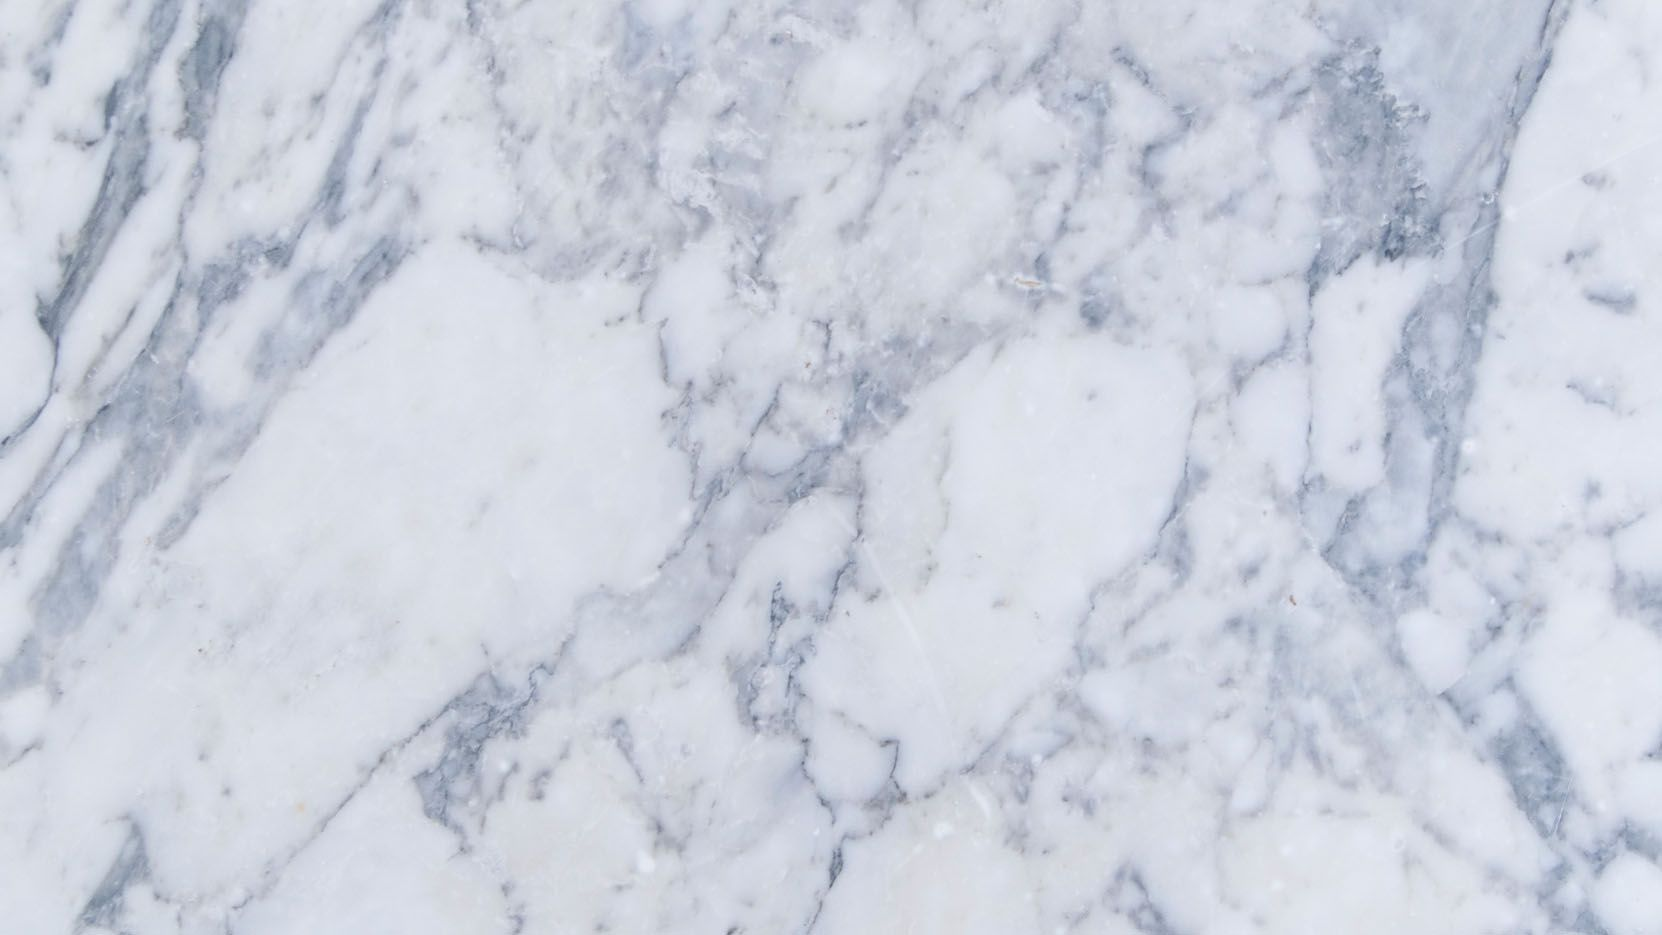 Amazing Wallpaper Marble Print - ef253c0ece27b562b430feeece0c79df  HD_783966.jpg